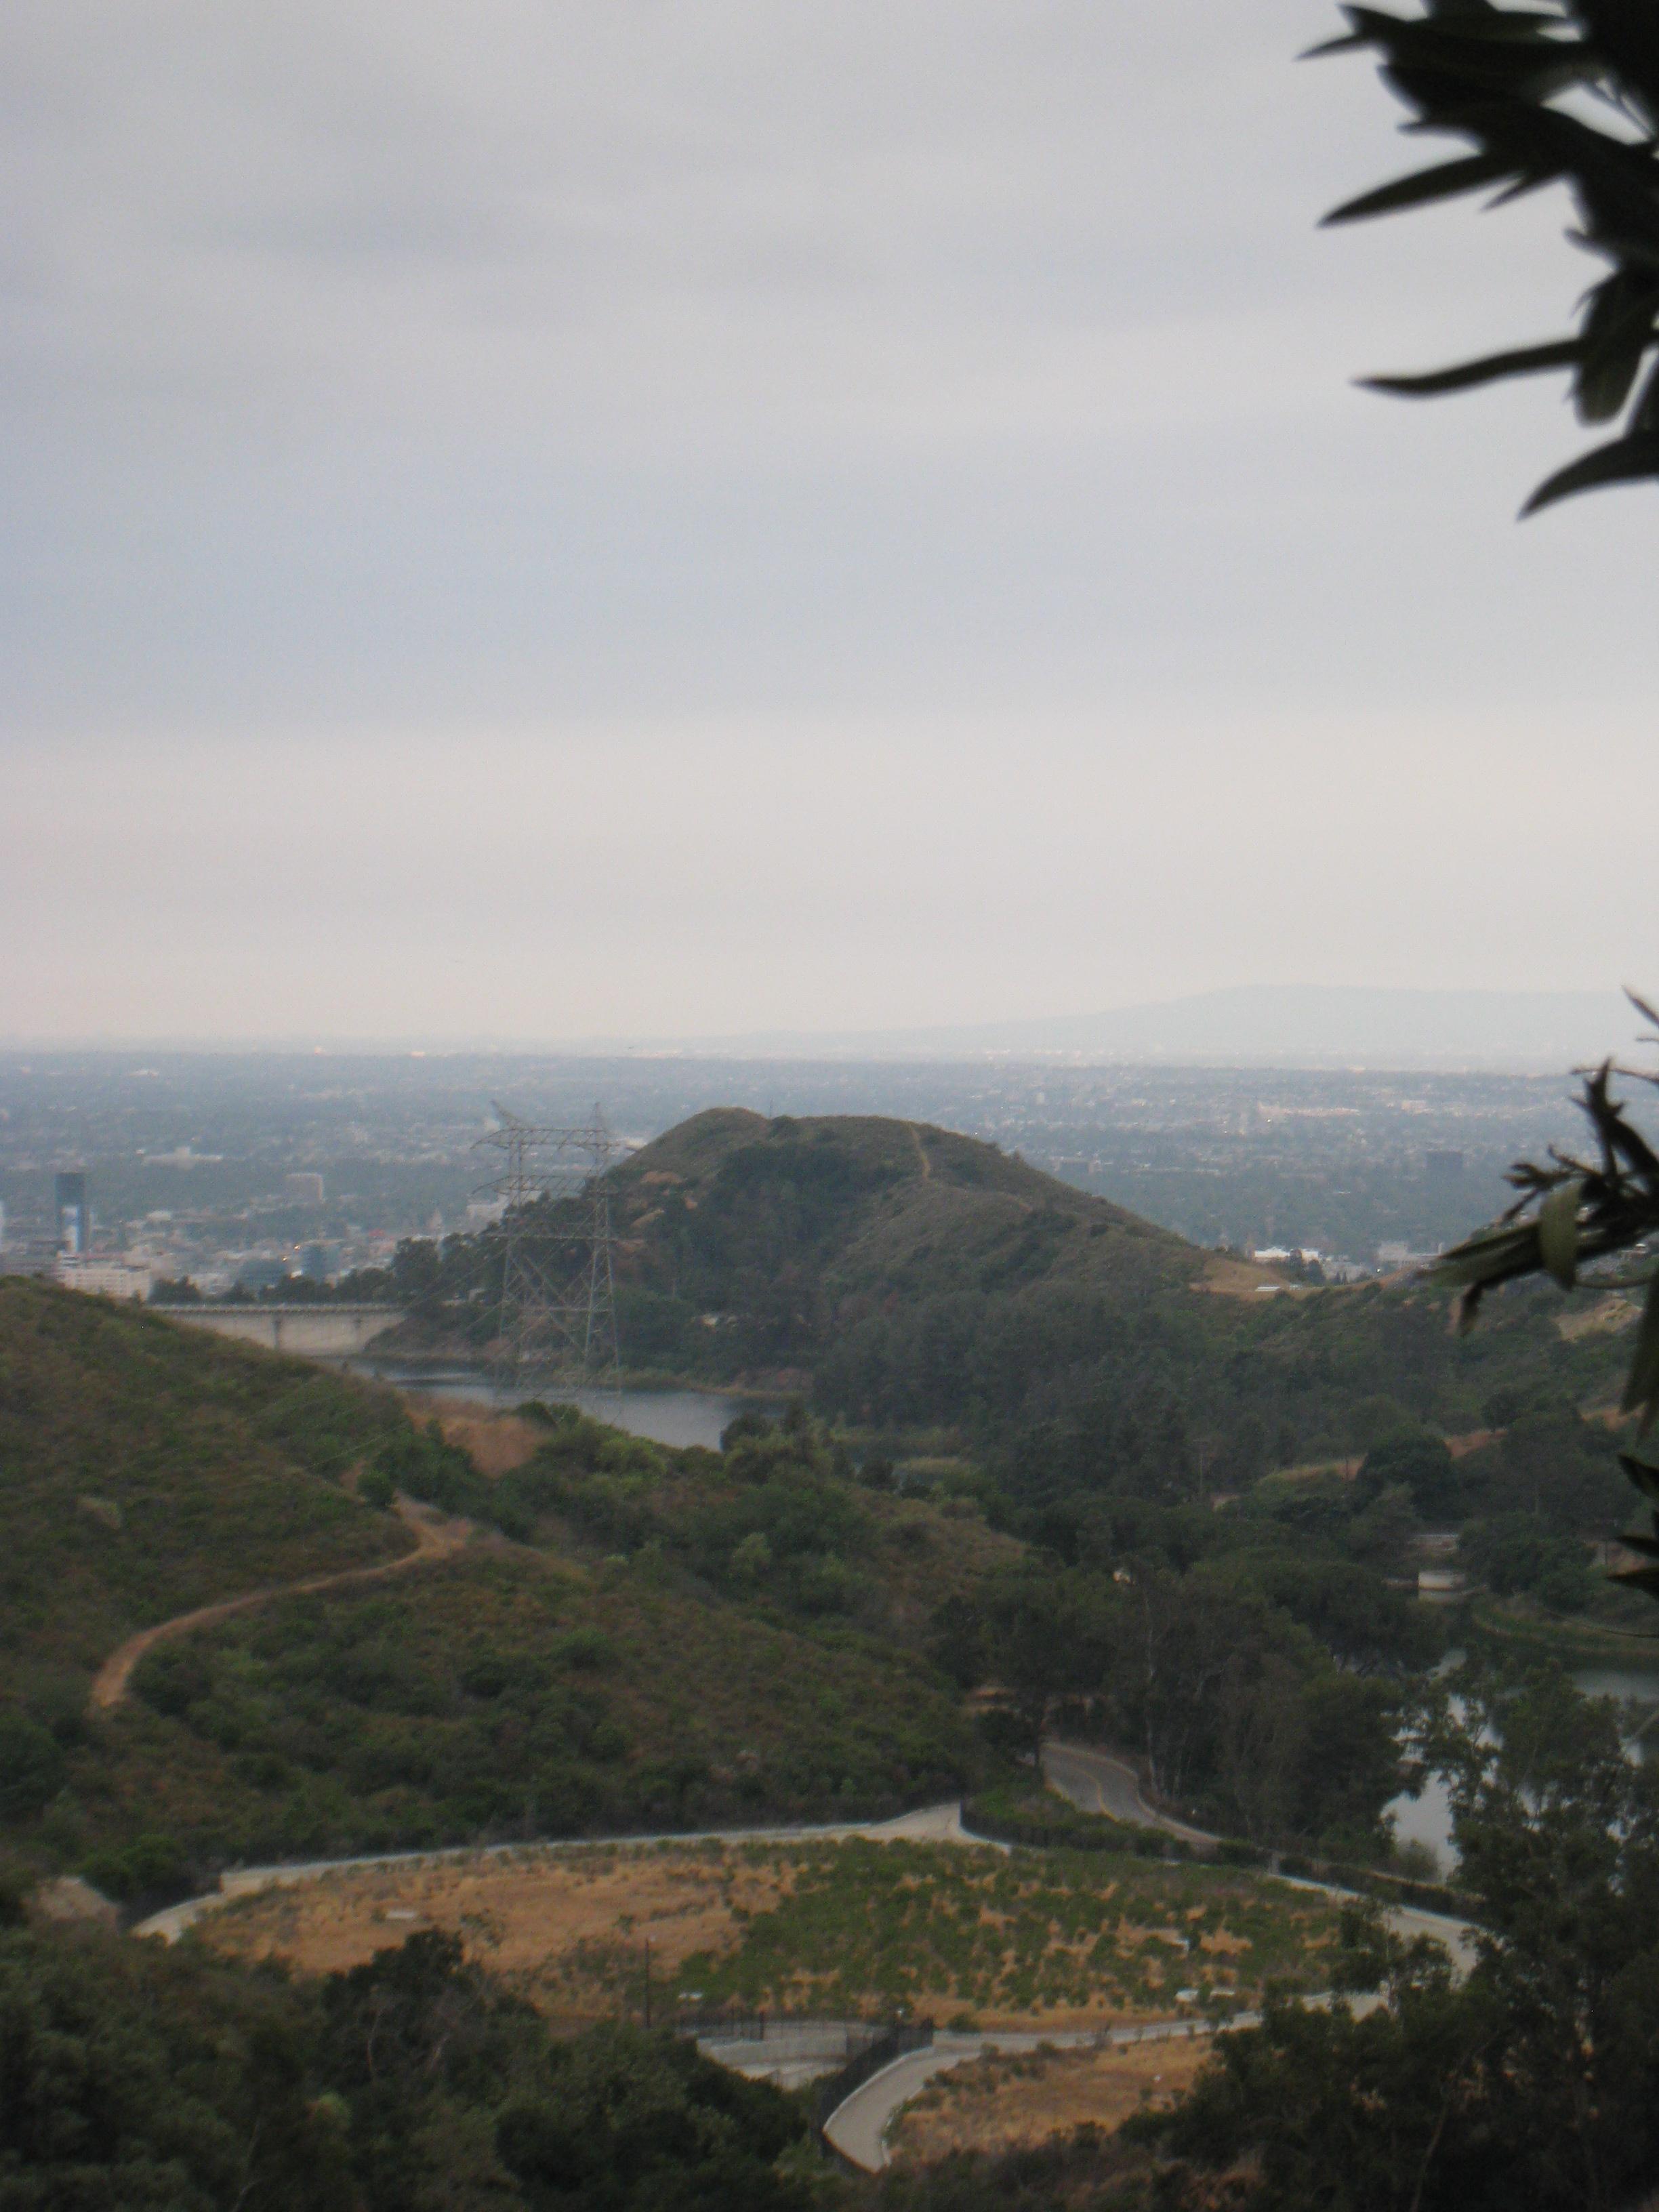 Lake Hollywood from Wonder View Drive, below the Cahuenga Peak parcel